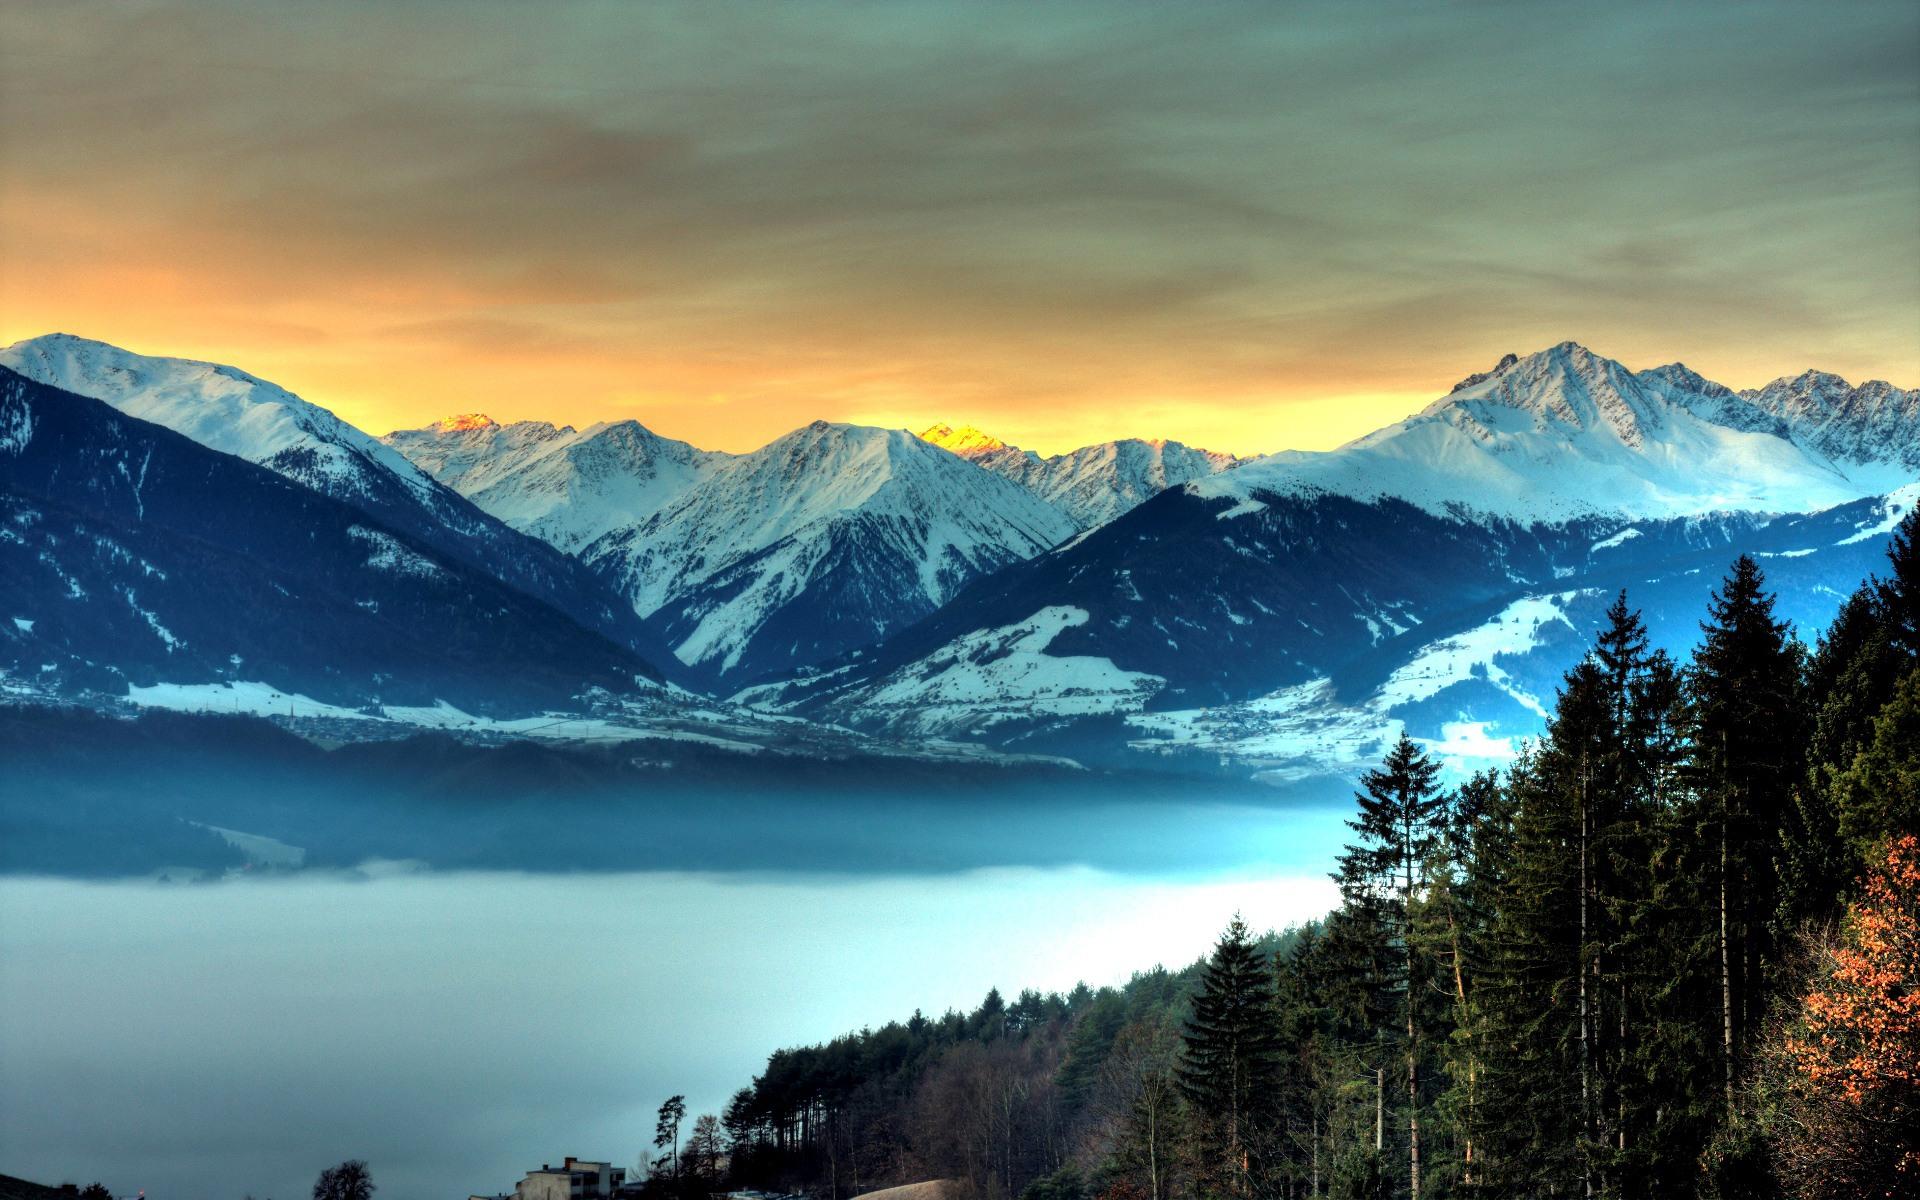 46 Mountains Wallpaper For Desktop On Wallpapersafari